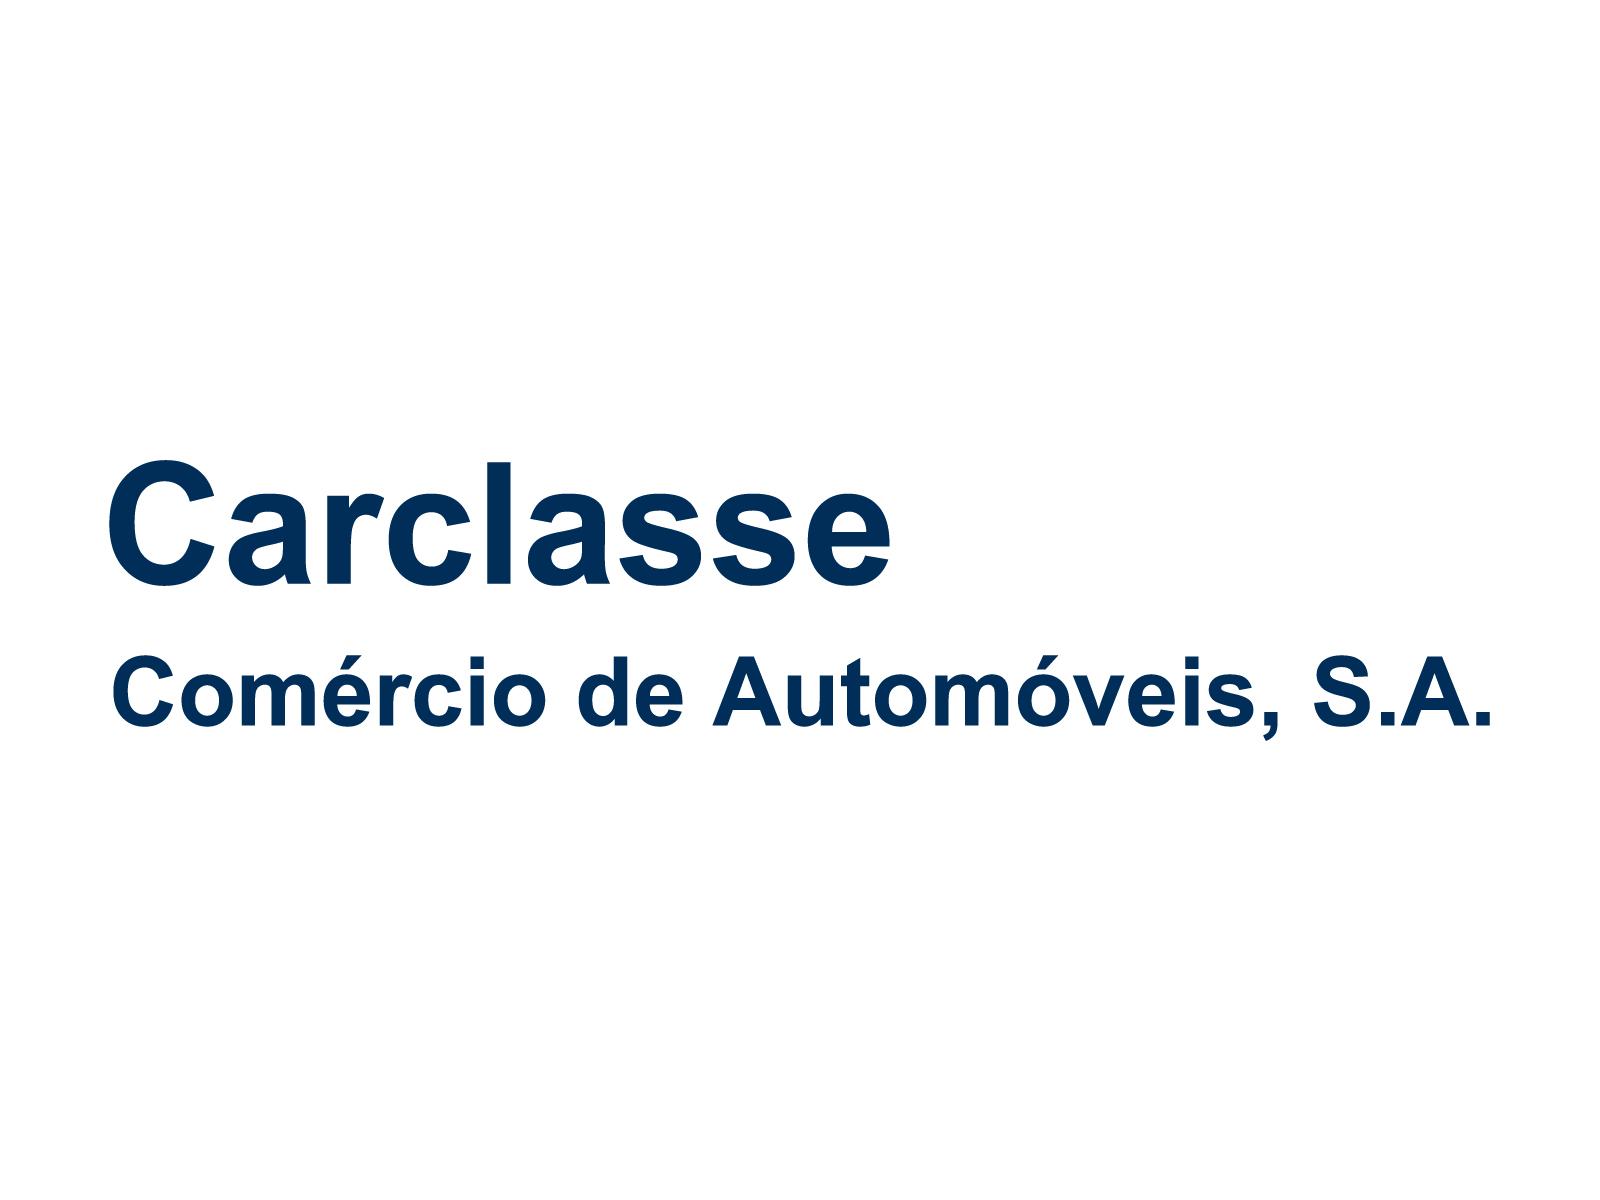 Carclasse